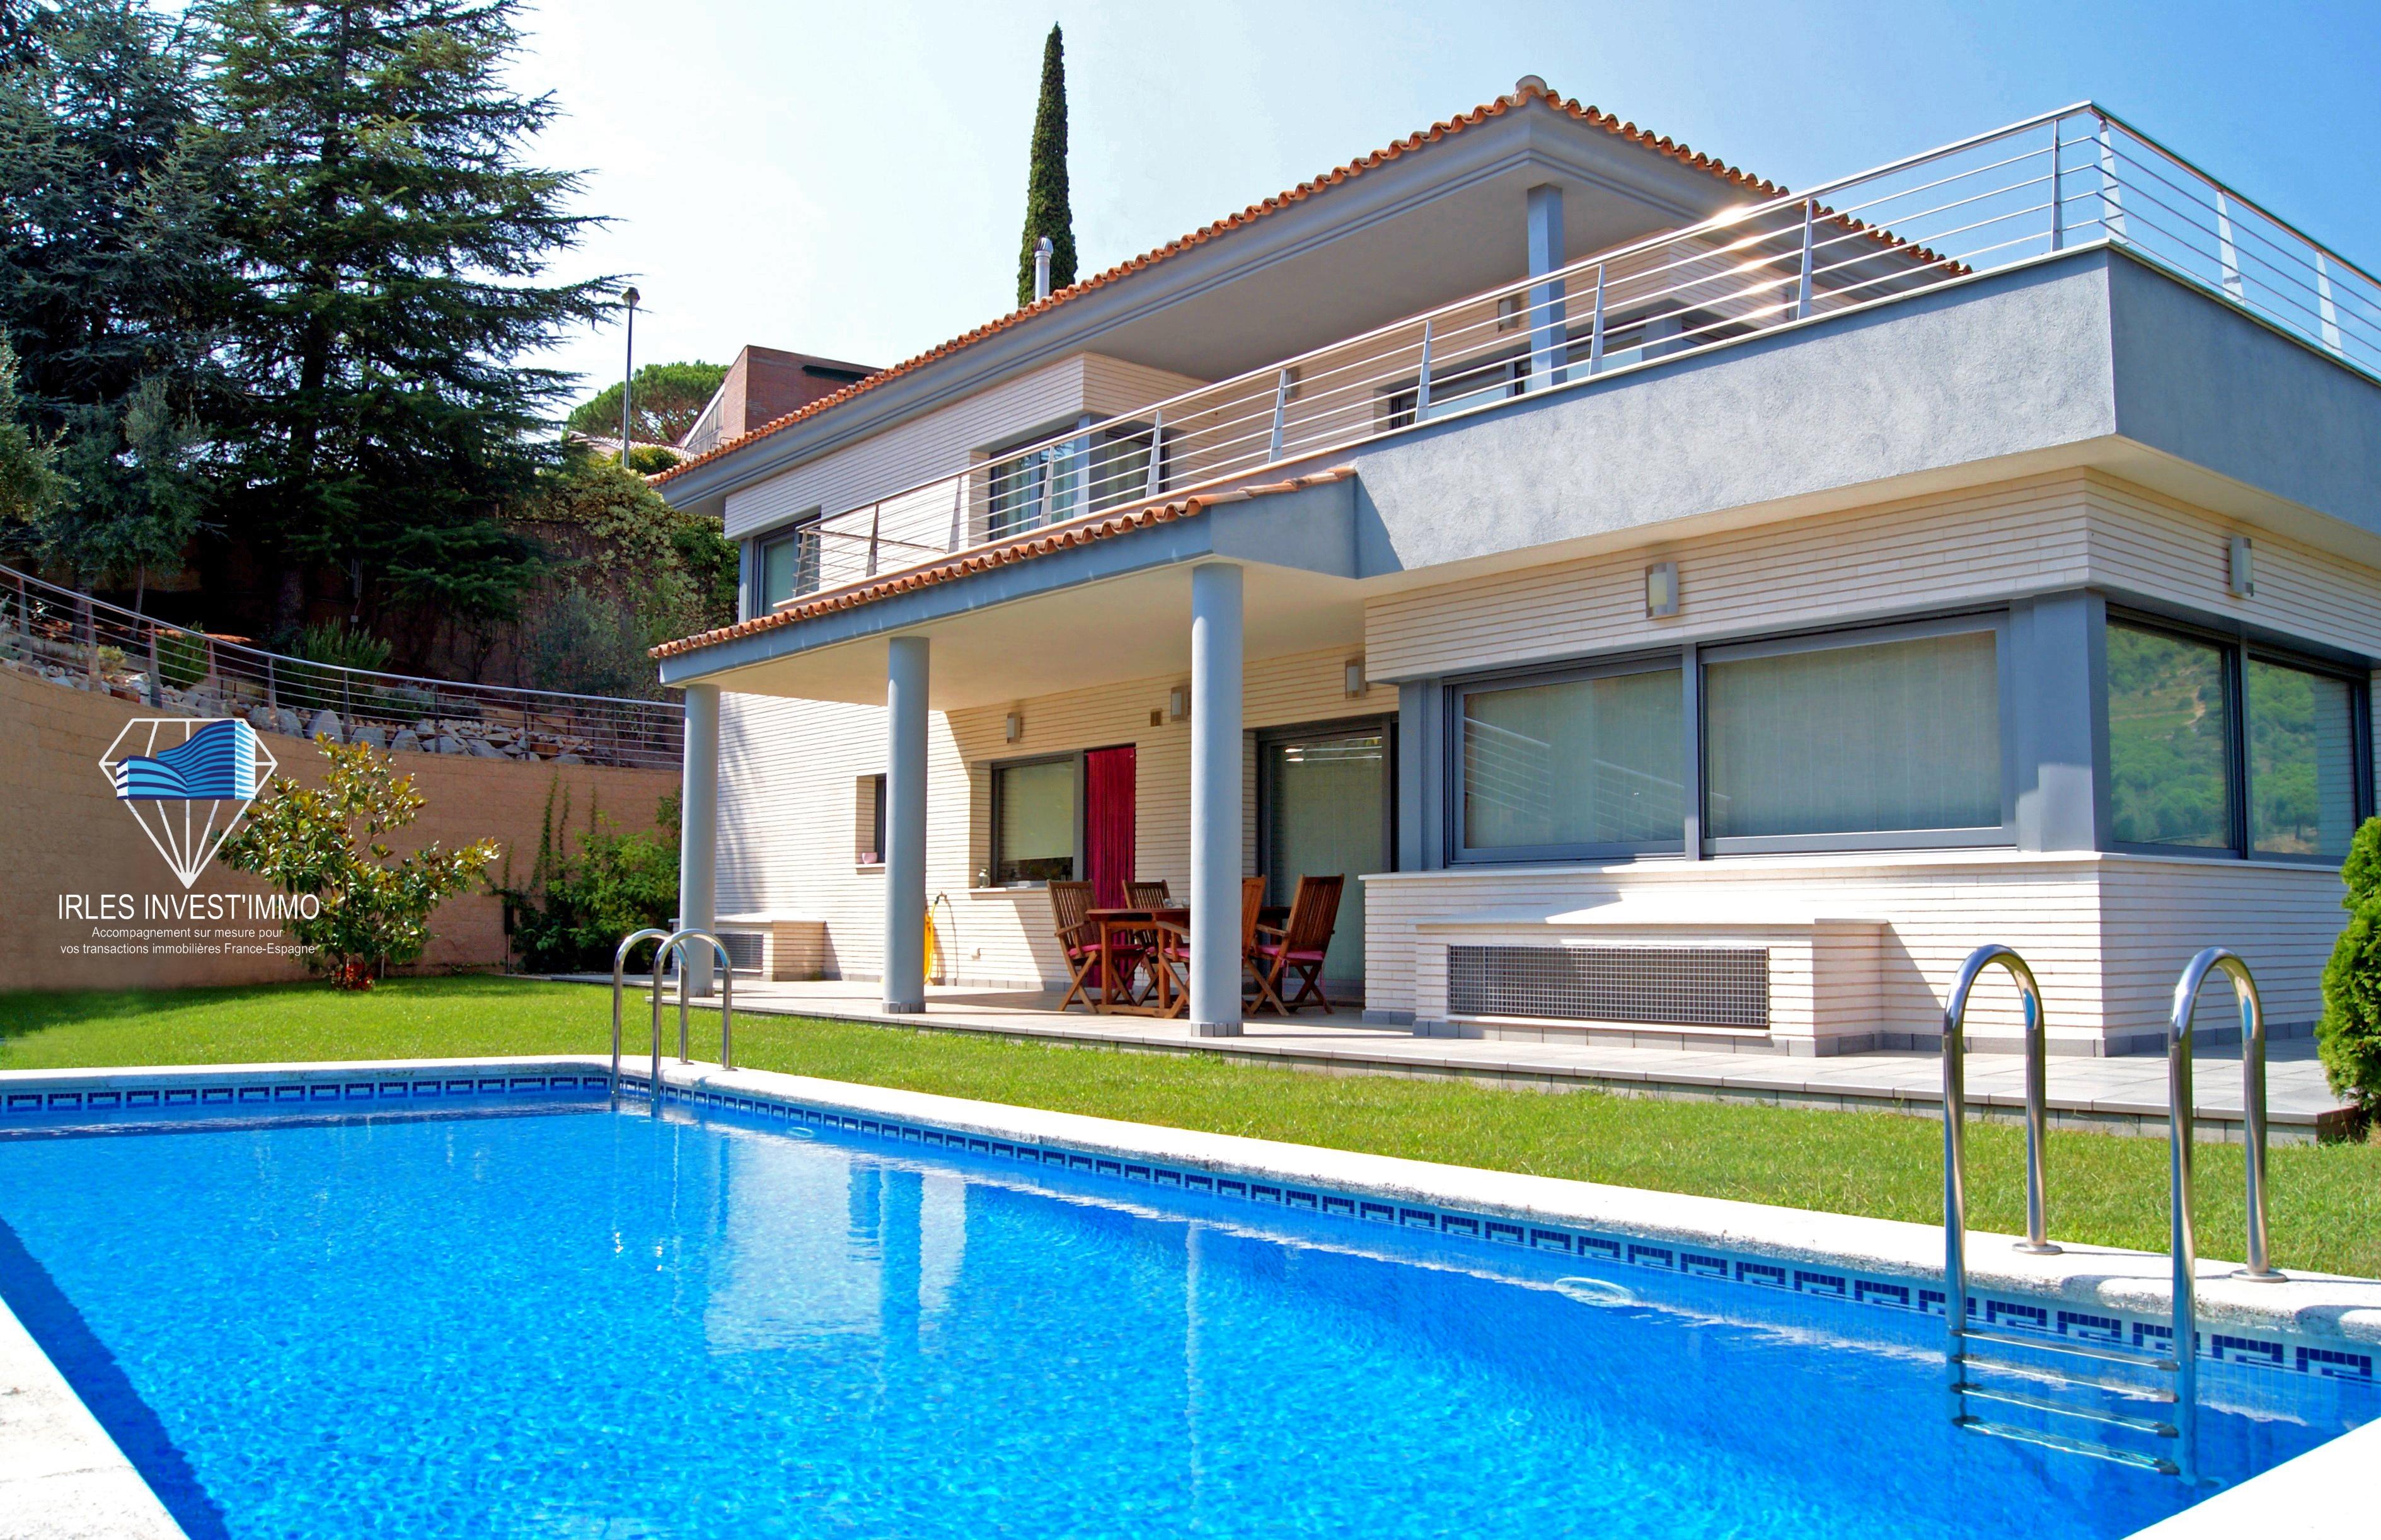 Vente maison barcelone espagne avie home for Appartement ou maison a acheter